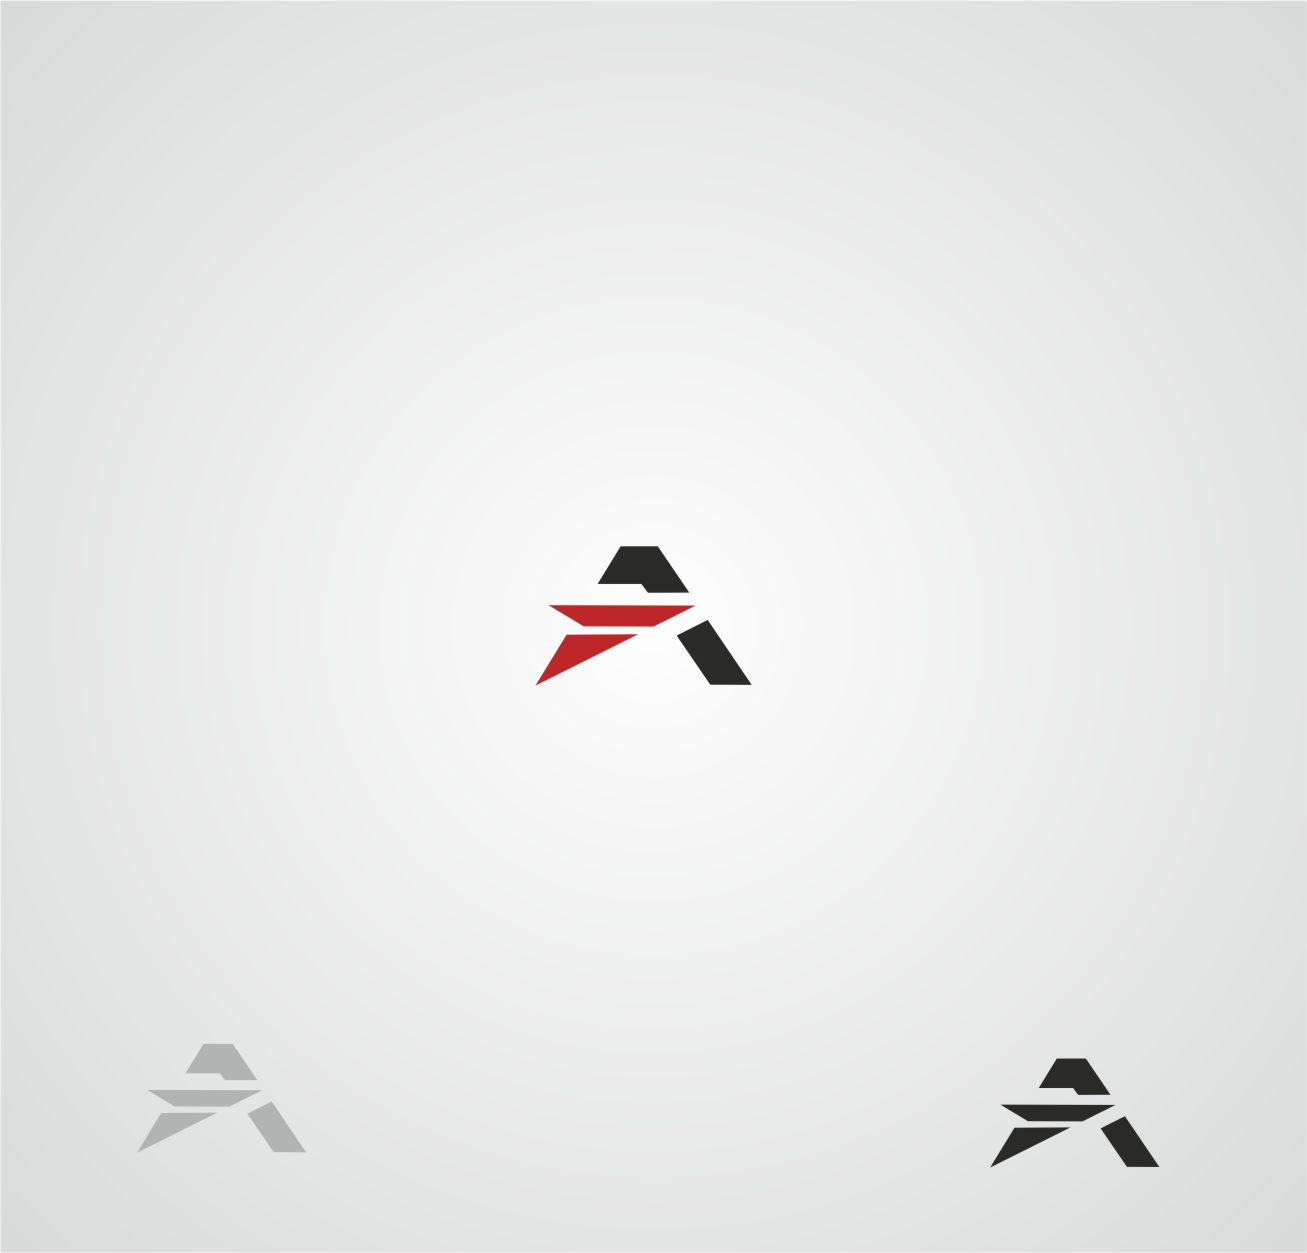 Лого и фирменный стиль (бланк, визитка) фото f_9735186bdd52b030.jpg